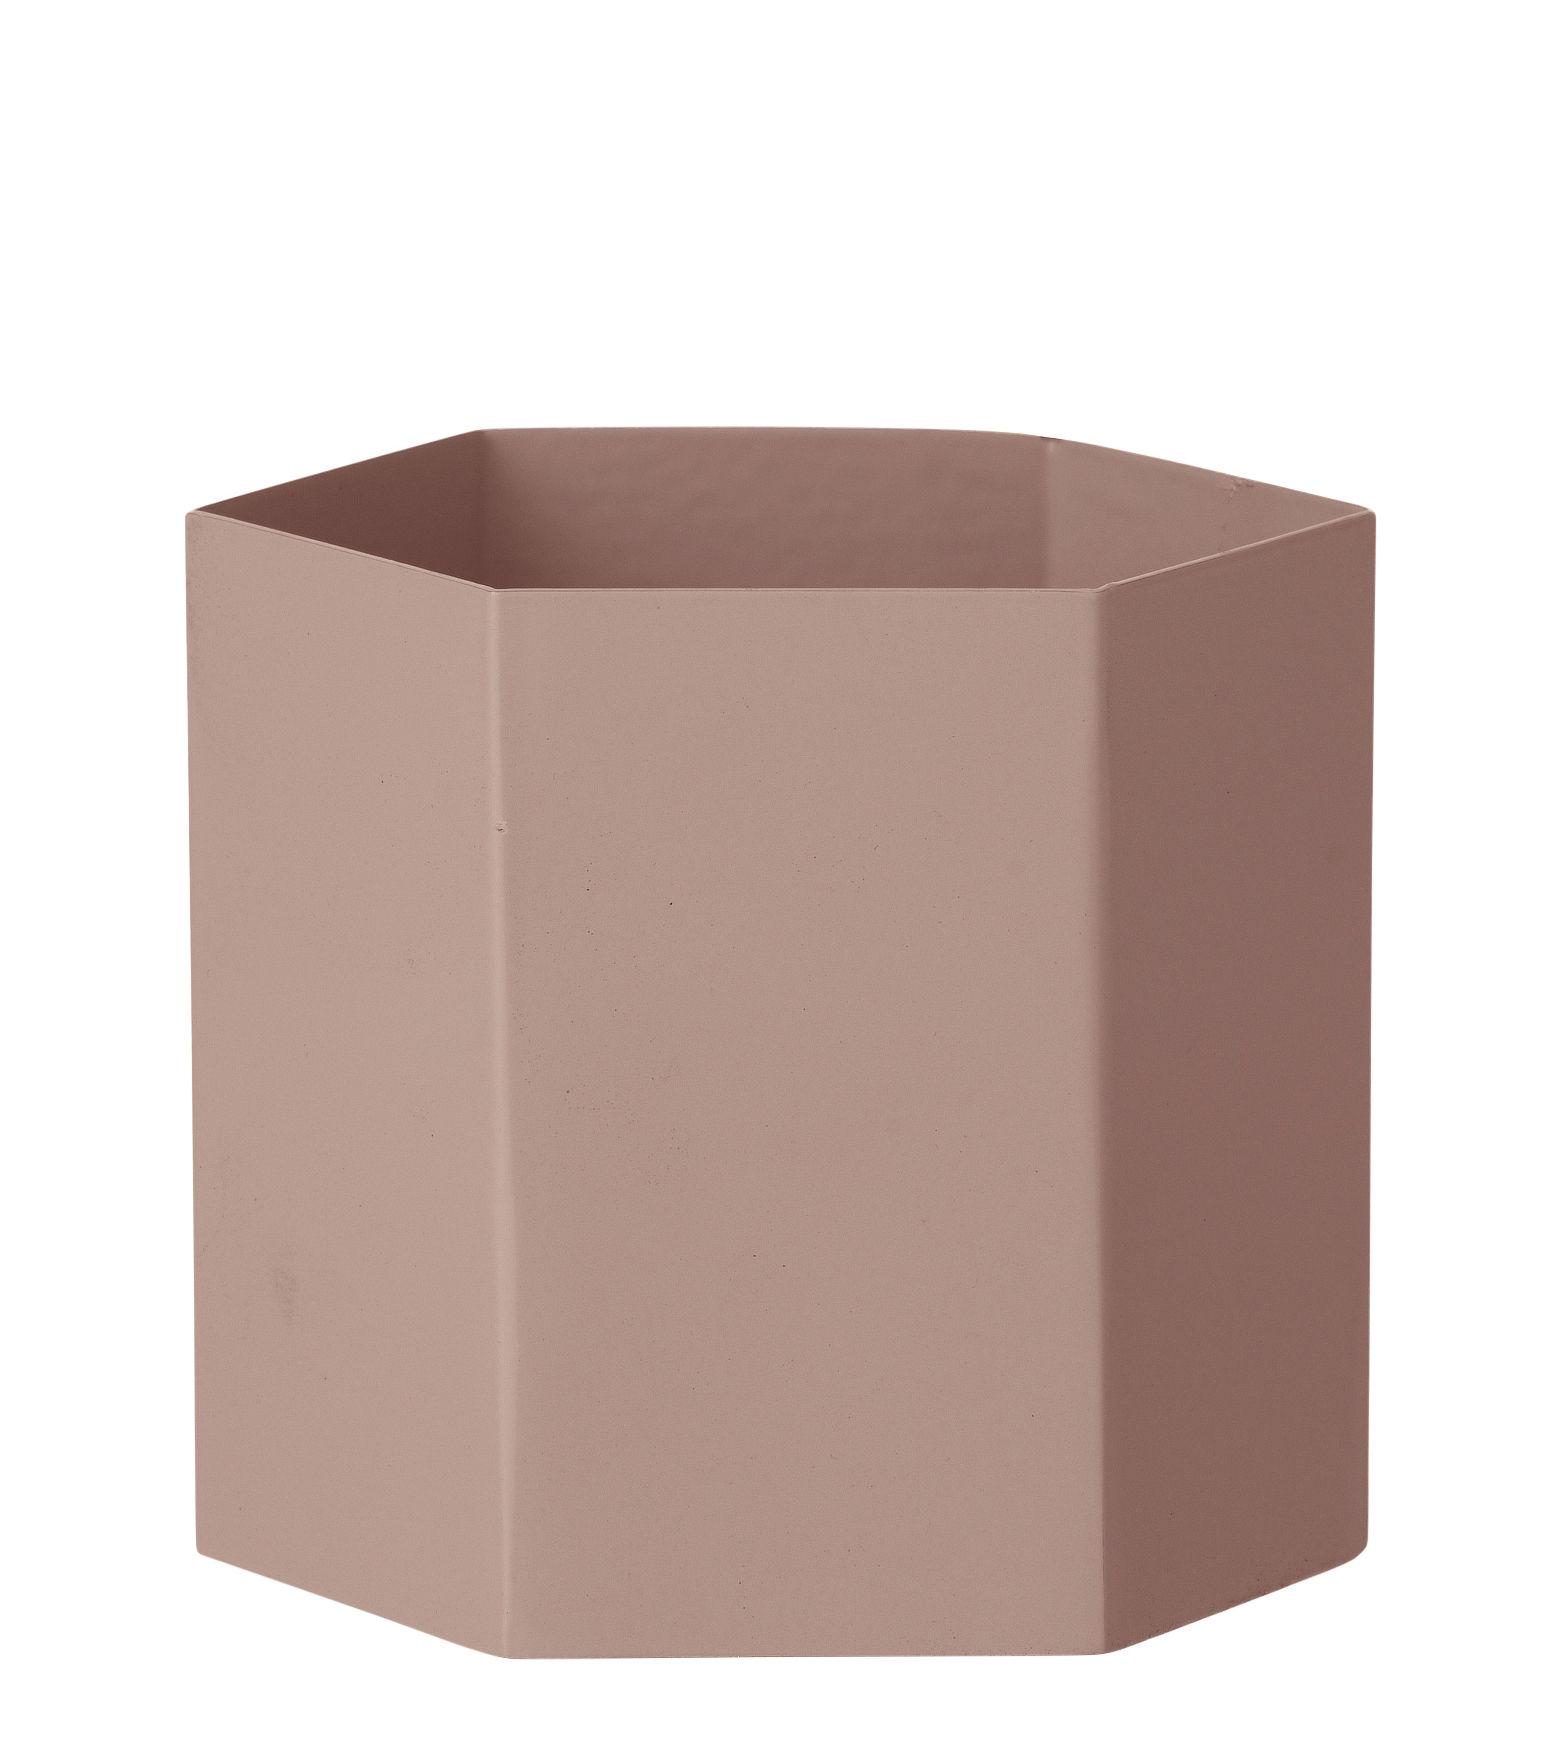 Accessories - Desk & Office Accessories - Hexagon Large Flowerpot - / Ø 13.5 cm x H 12 cm by Ferm Living - Pink - Lacquered metal